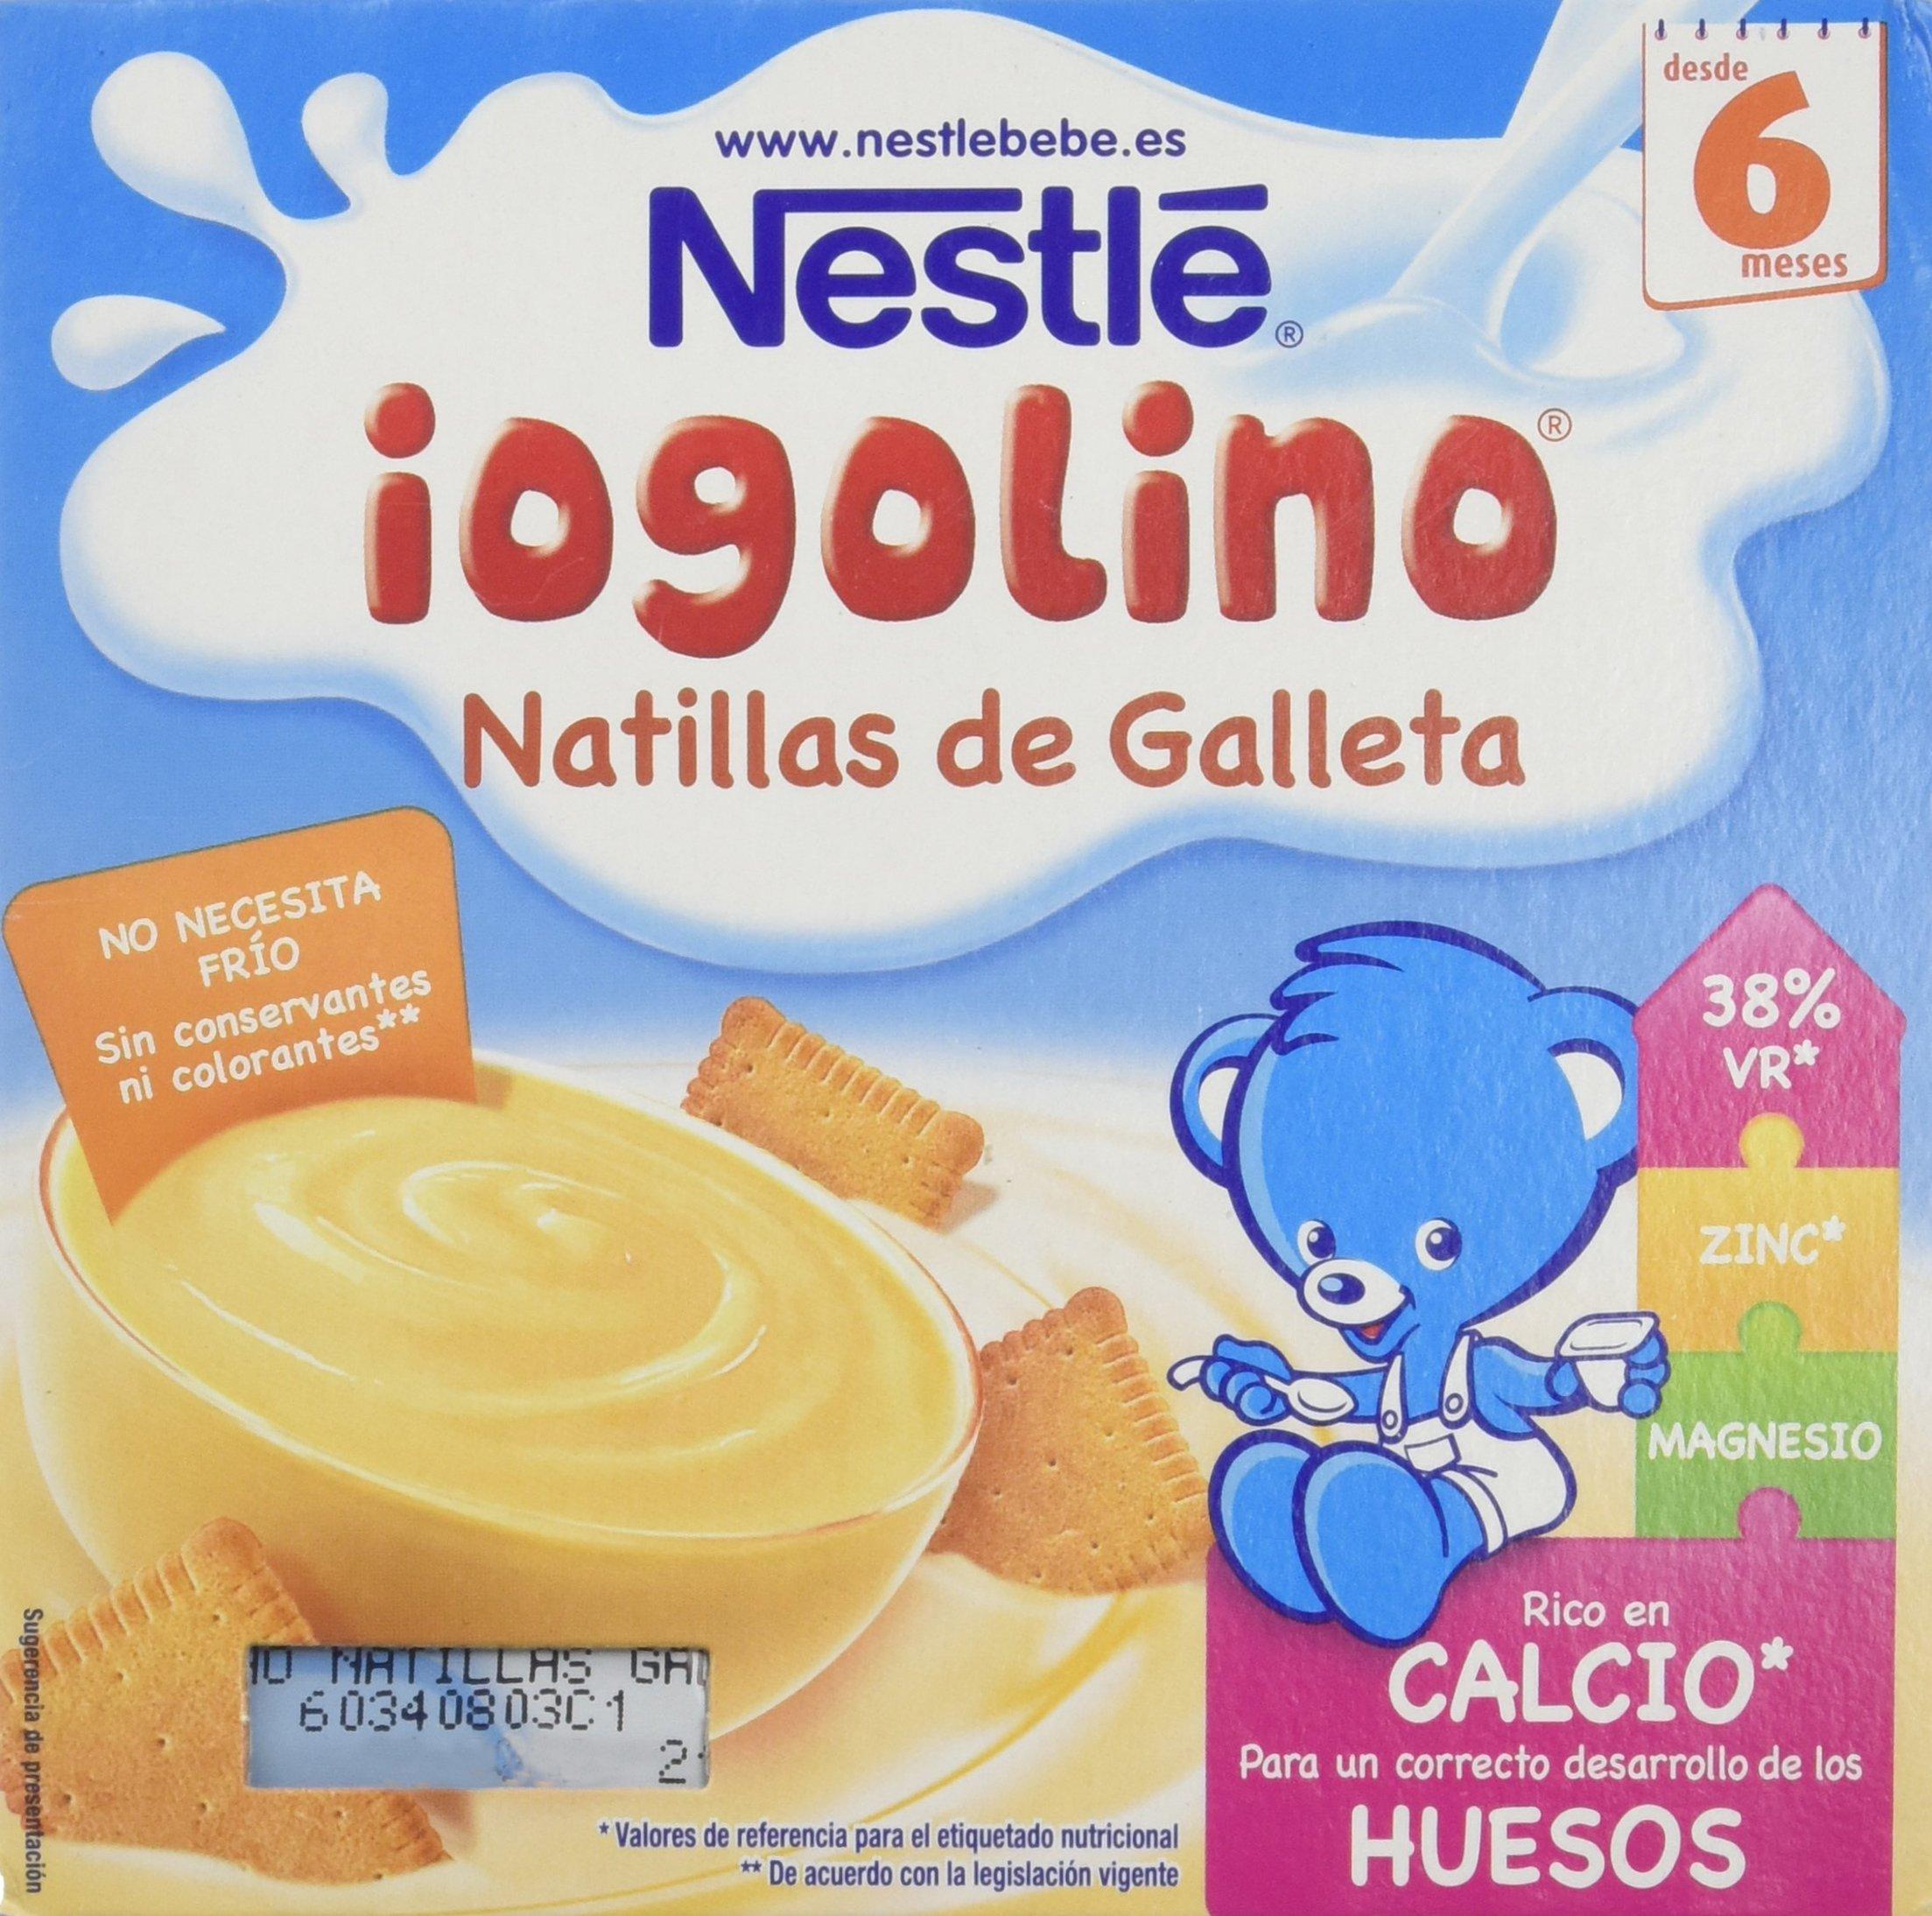 Nestlé Iogolino - Alimento infantil, natillas con galleta - Paquete de 4 x 100 gr - Total: 400 gr -